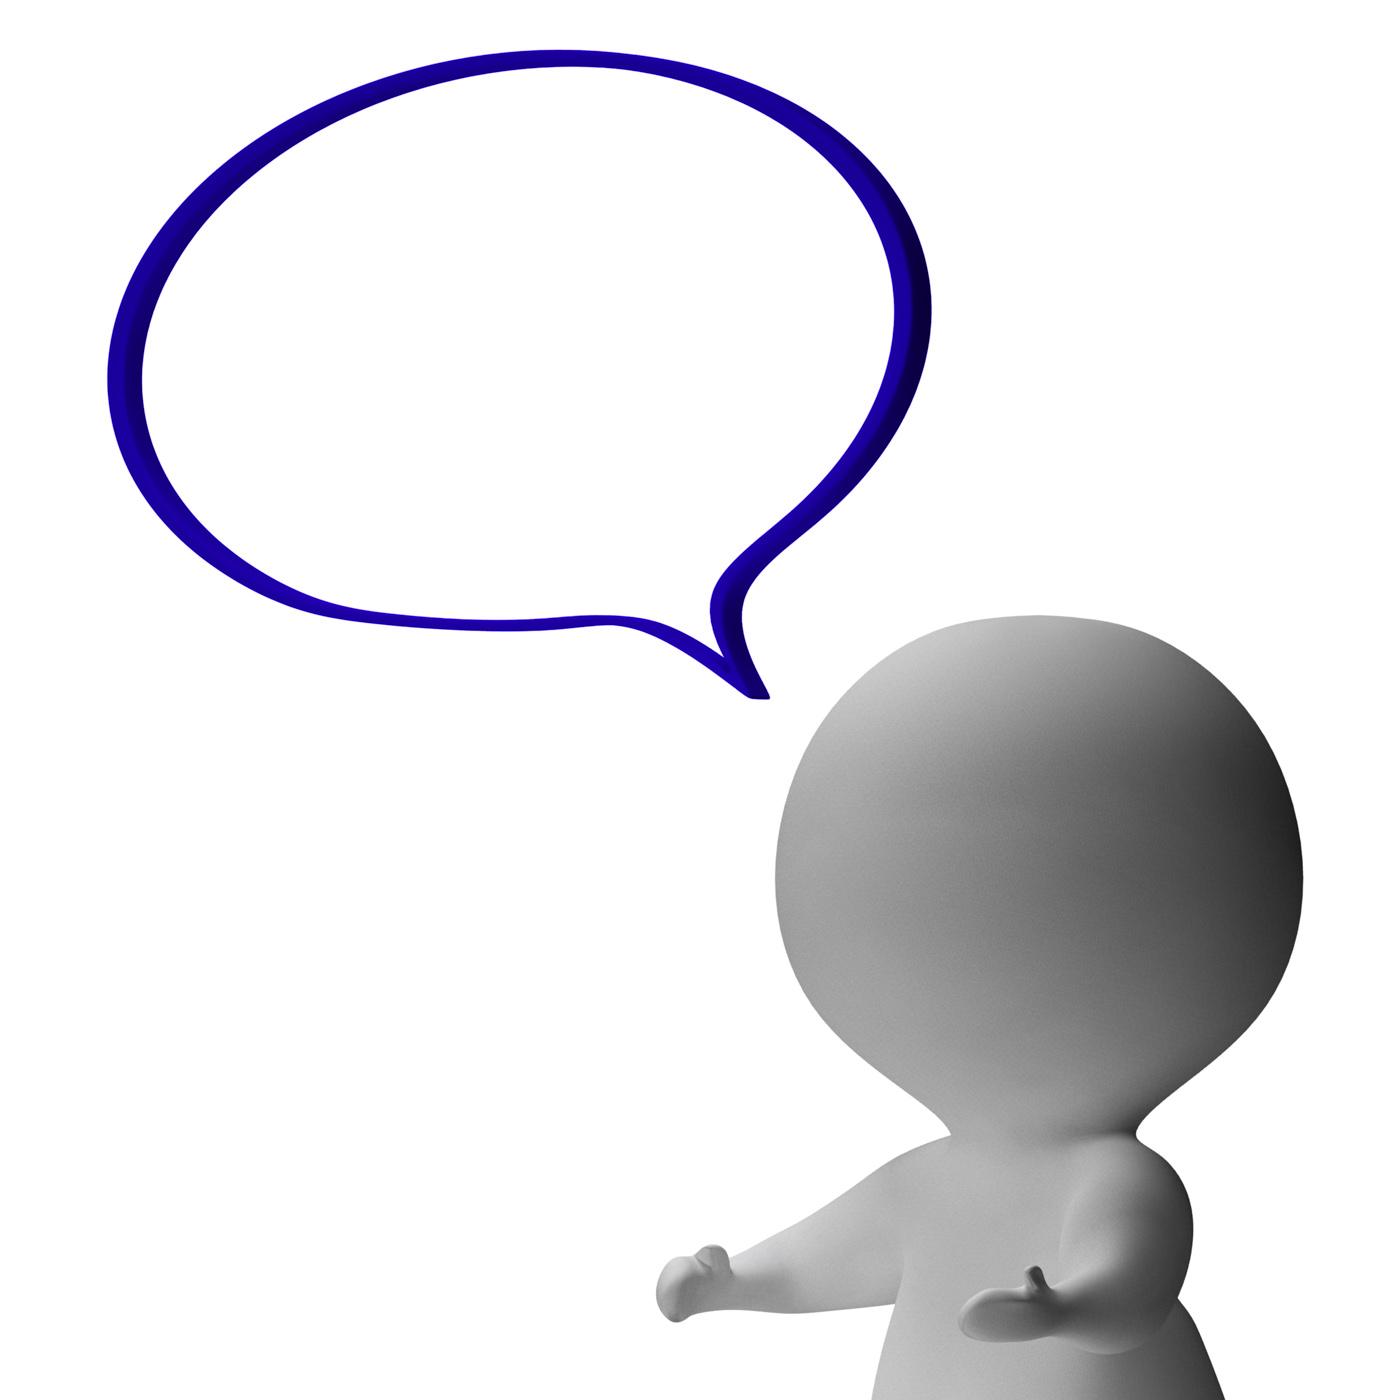 Speech Bubble And 3d Character Shows Speaking Or Announcement, 3d, Speechbubble, Speechballoon, Speech, HQ Photo